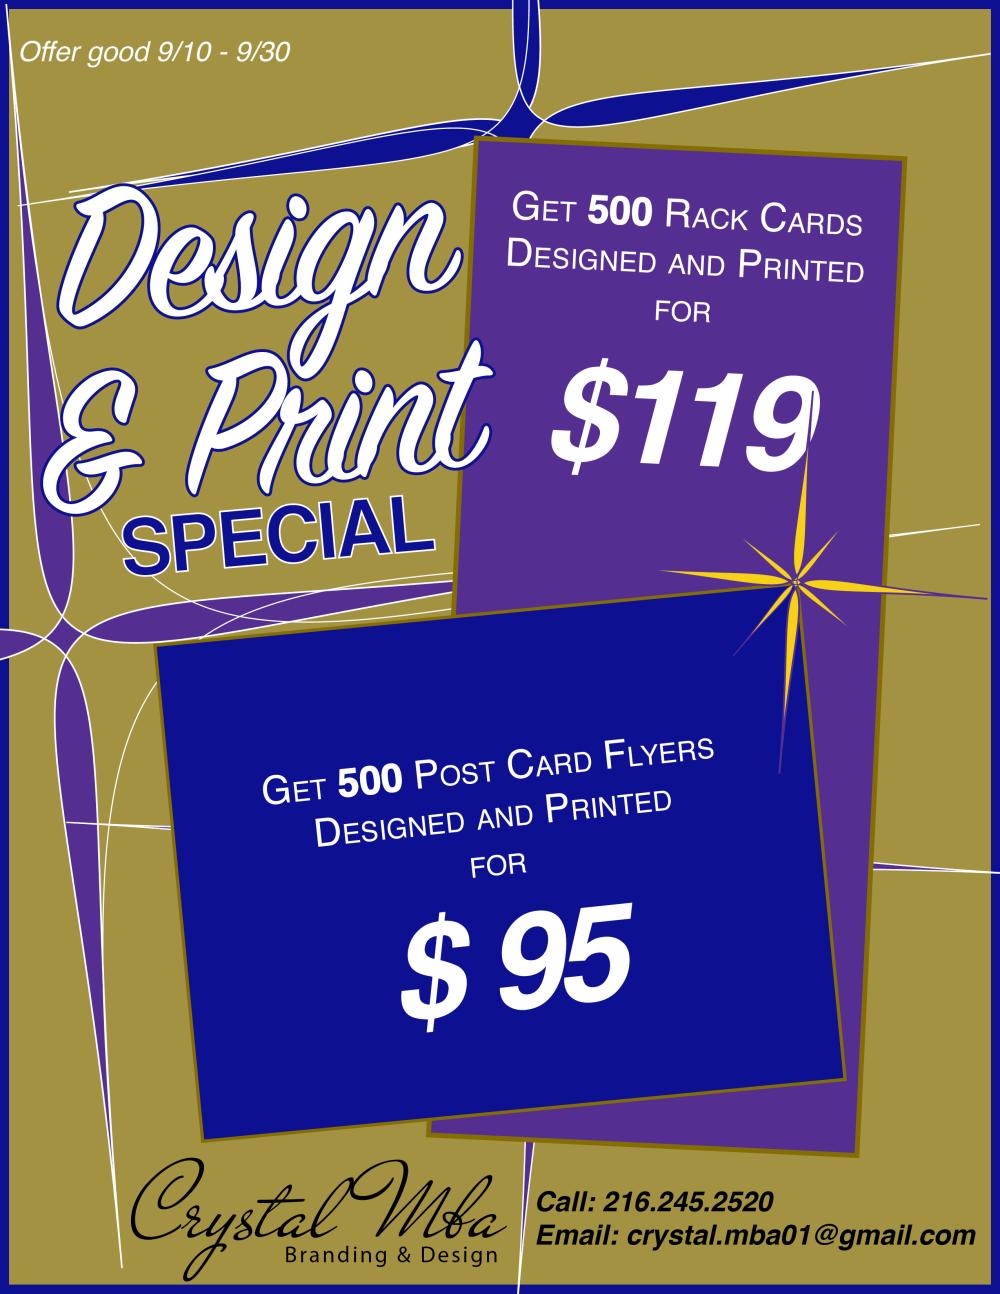 Fall 2019 DesignPrint Special